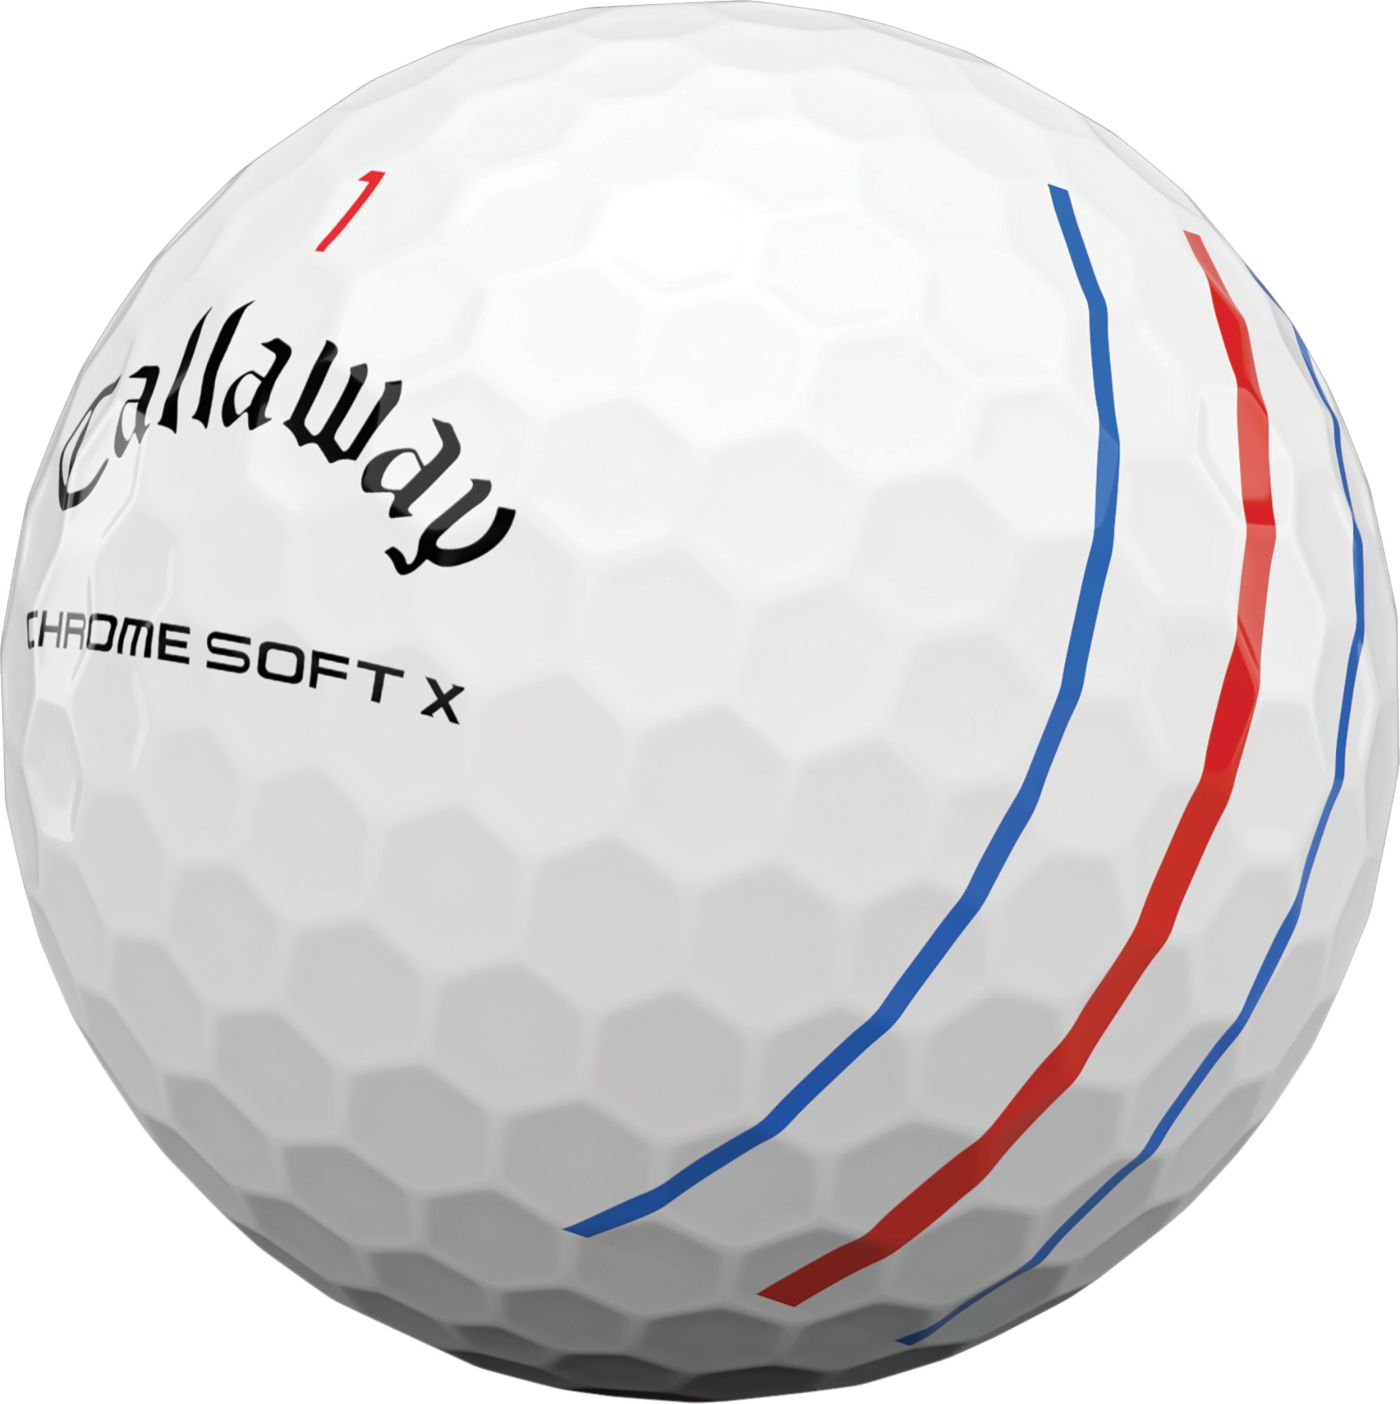 Callaway 2020 Chrome Soft X Triple Track Golf Balls